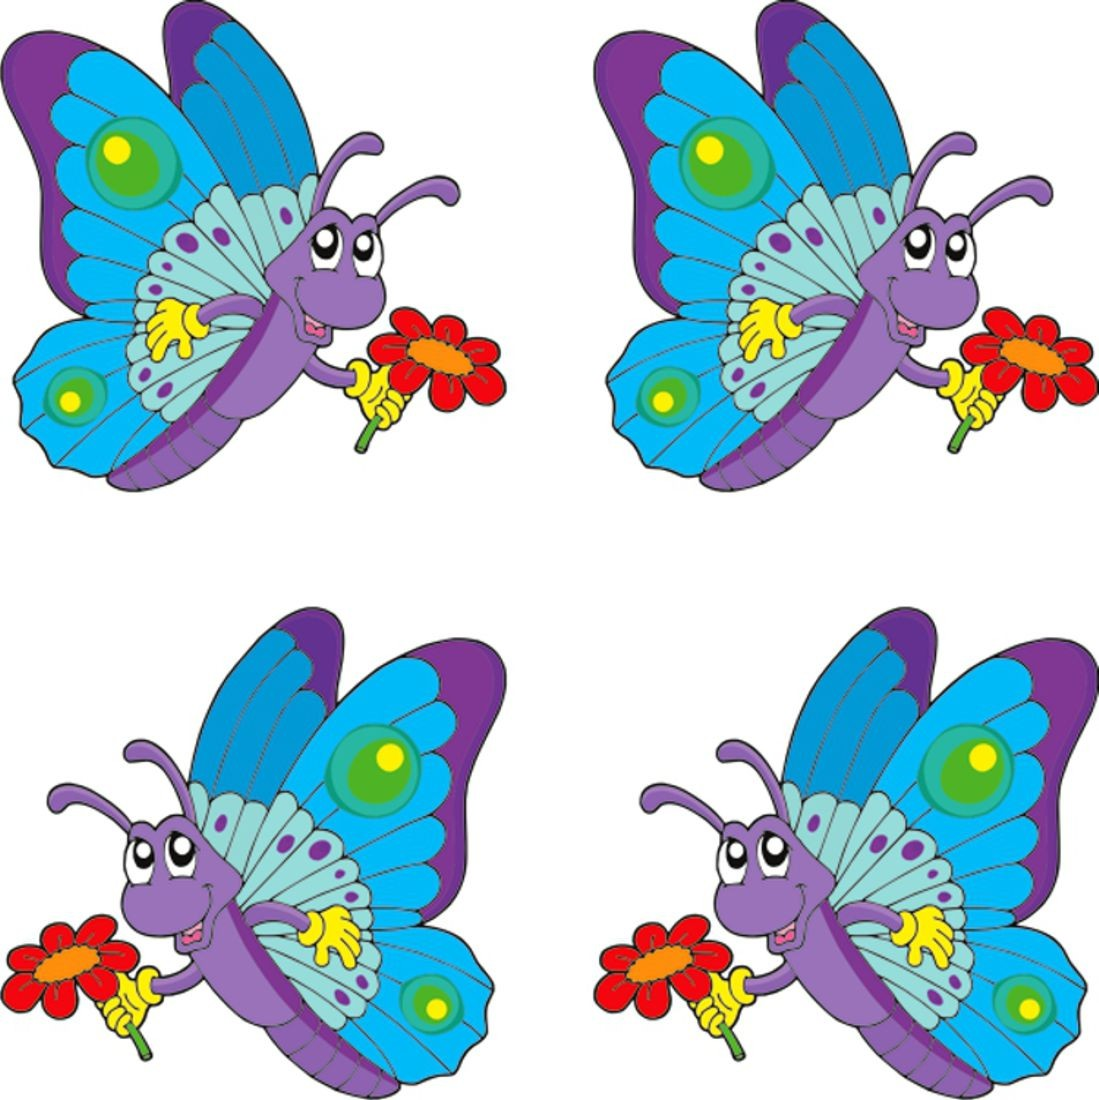 Aufkleber Schmetterling Dimension 4 Stück je 35 x 35 mm